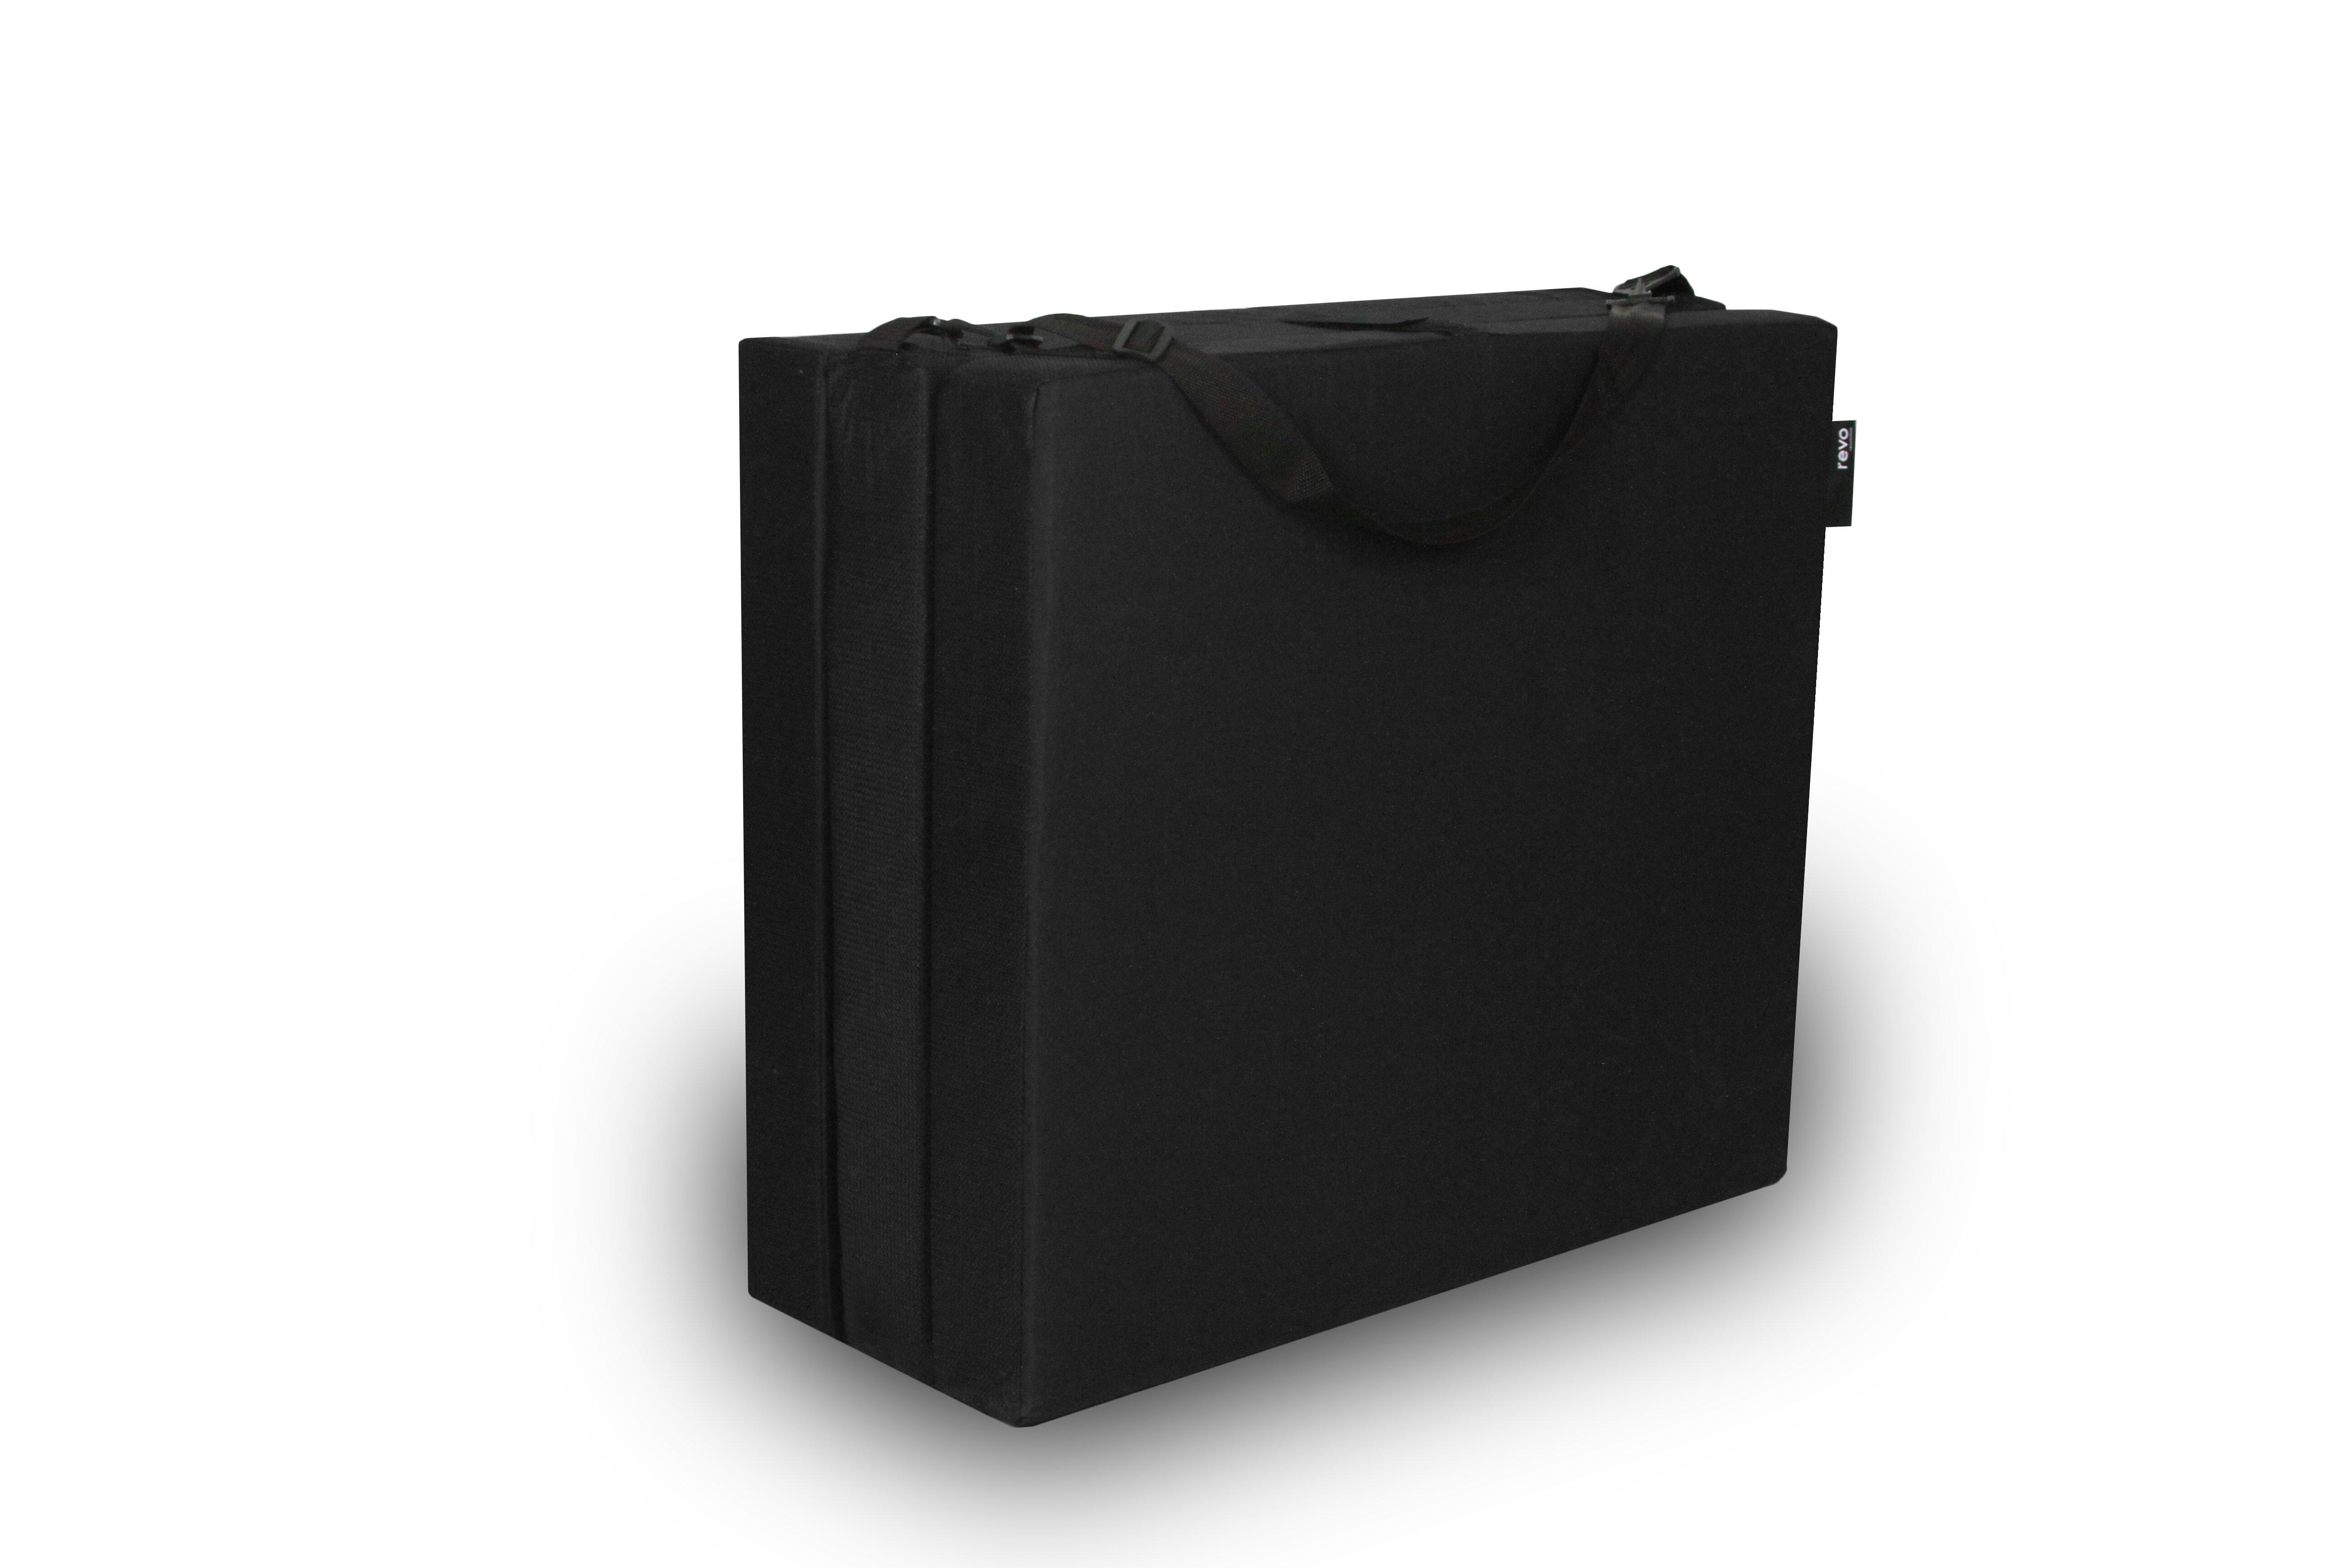 Elite Products Jr Twin Tri Fold Cot